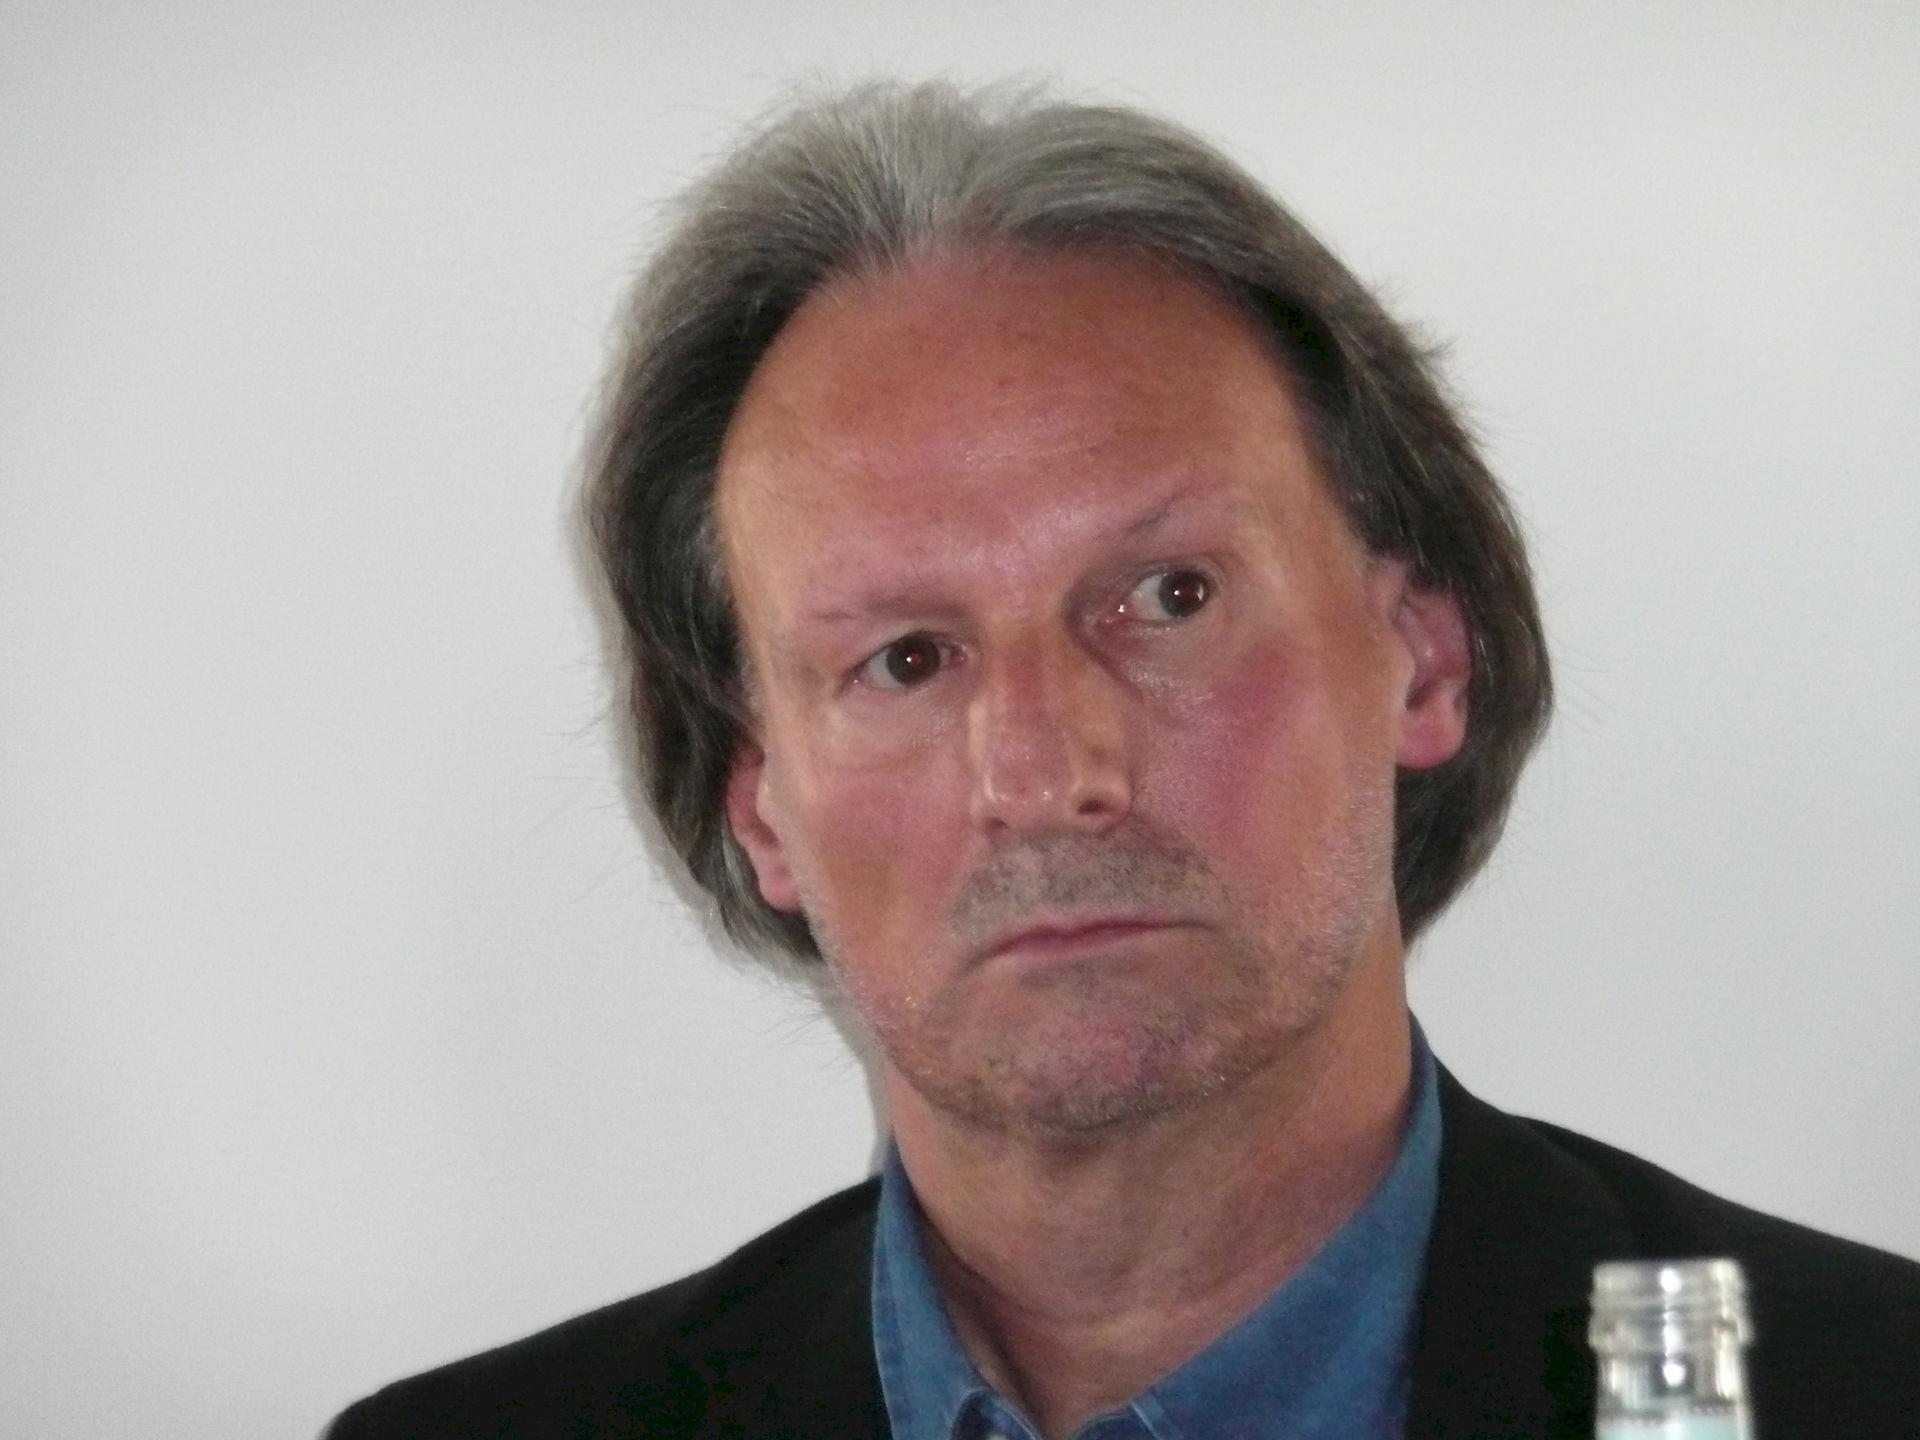 Photo of Jürg Amann: Author and dramatist